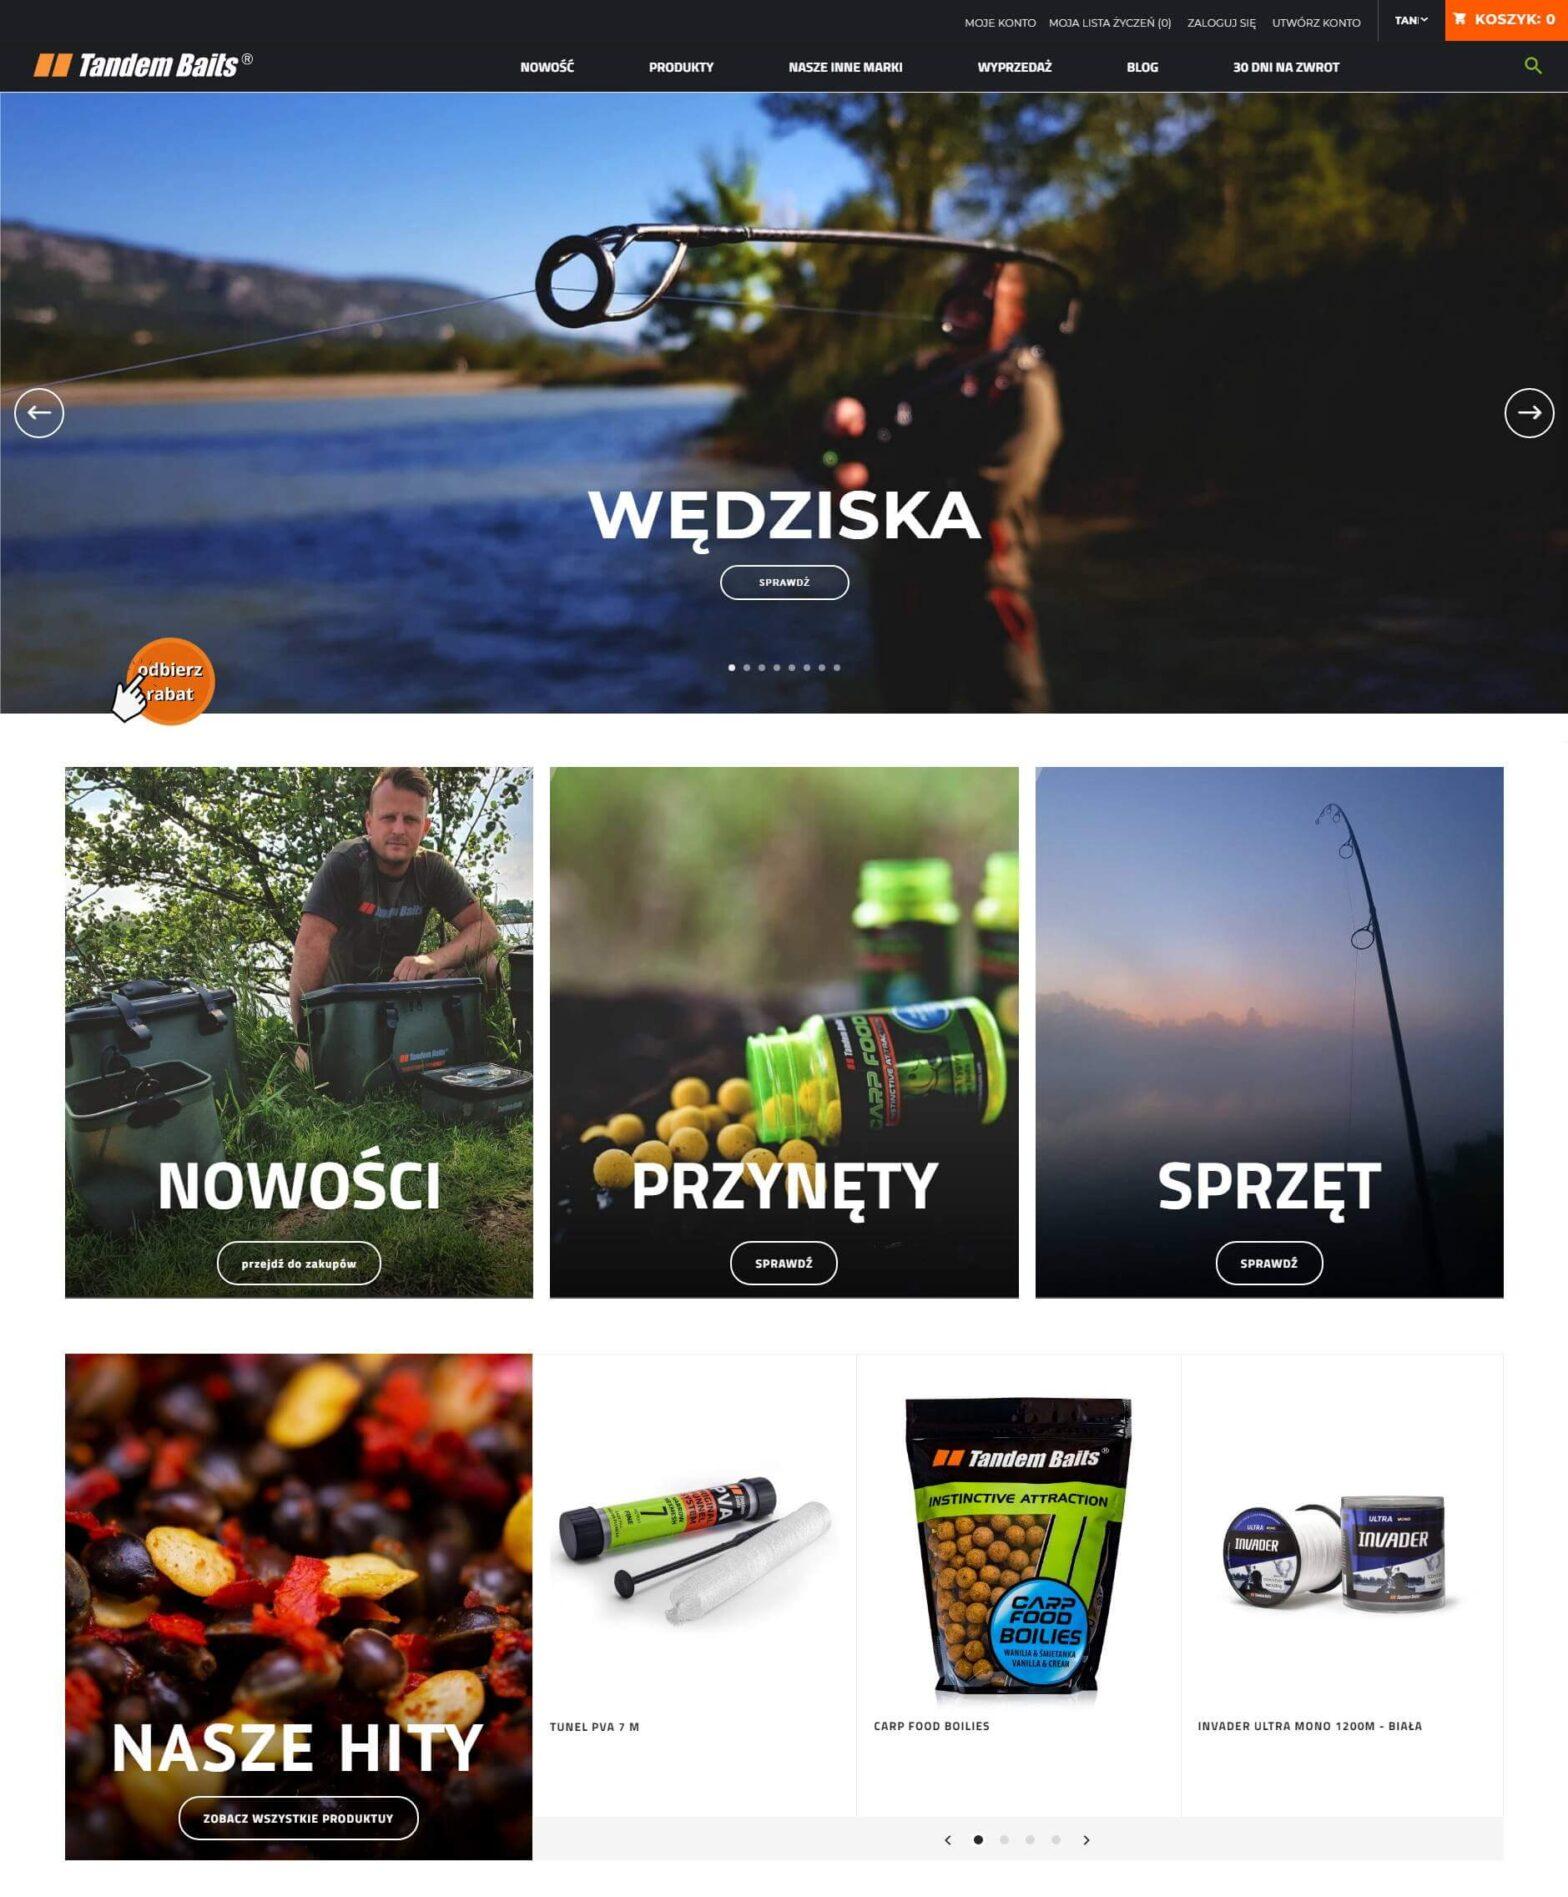 tandembaits.com- Wędkarski sklep internetowy